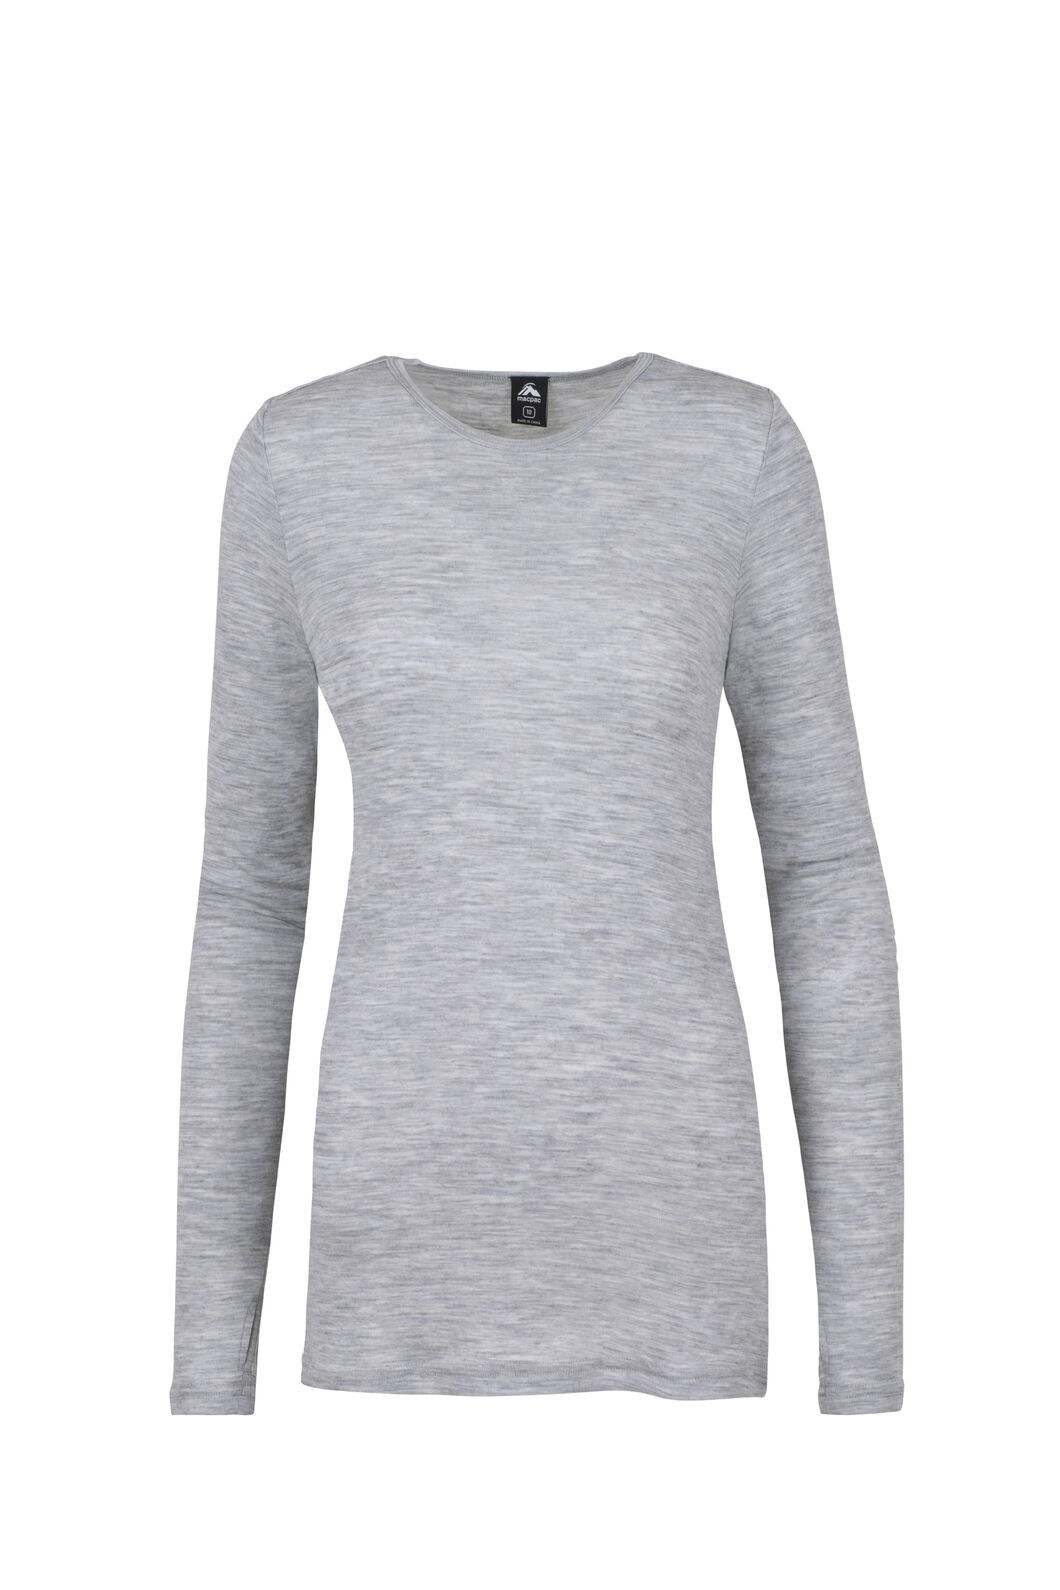 Macpac 220 Merino Top — Women's, Light Grey Marle, hi-res